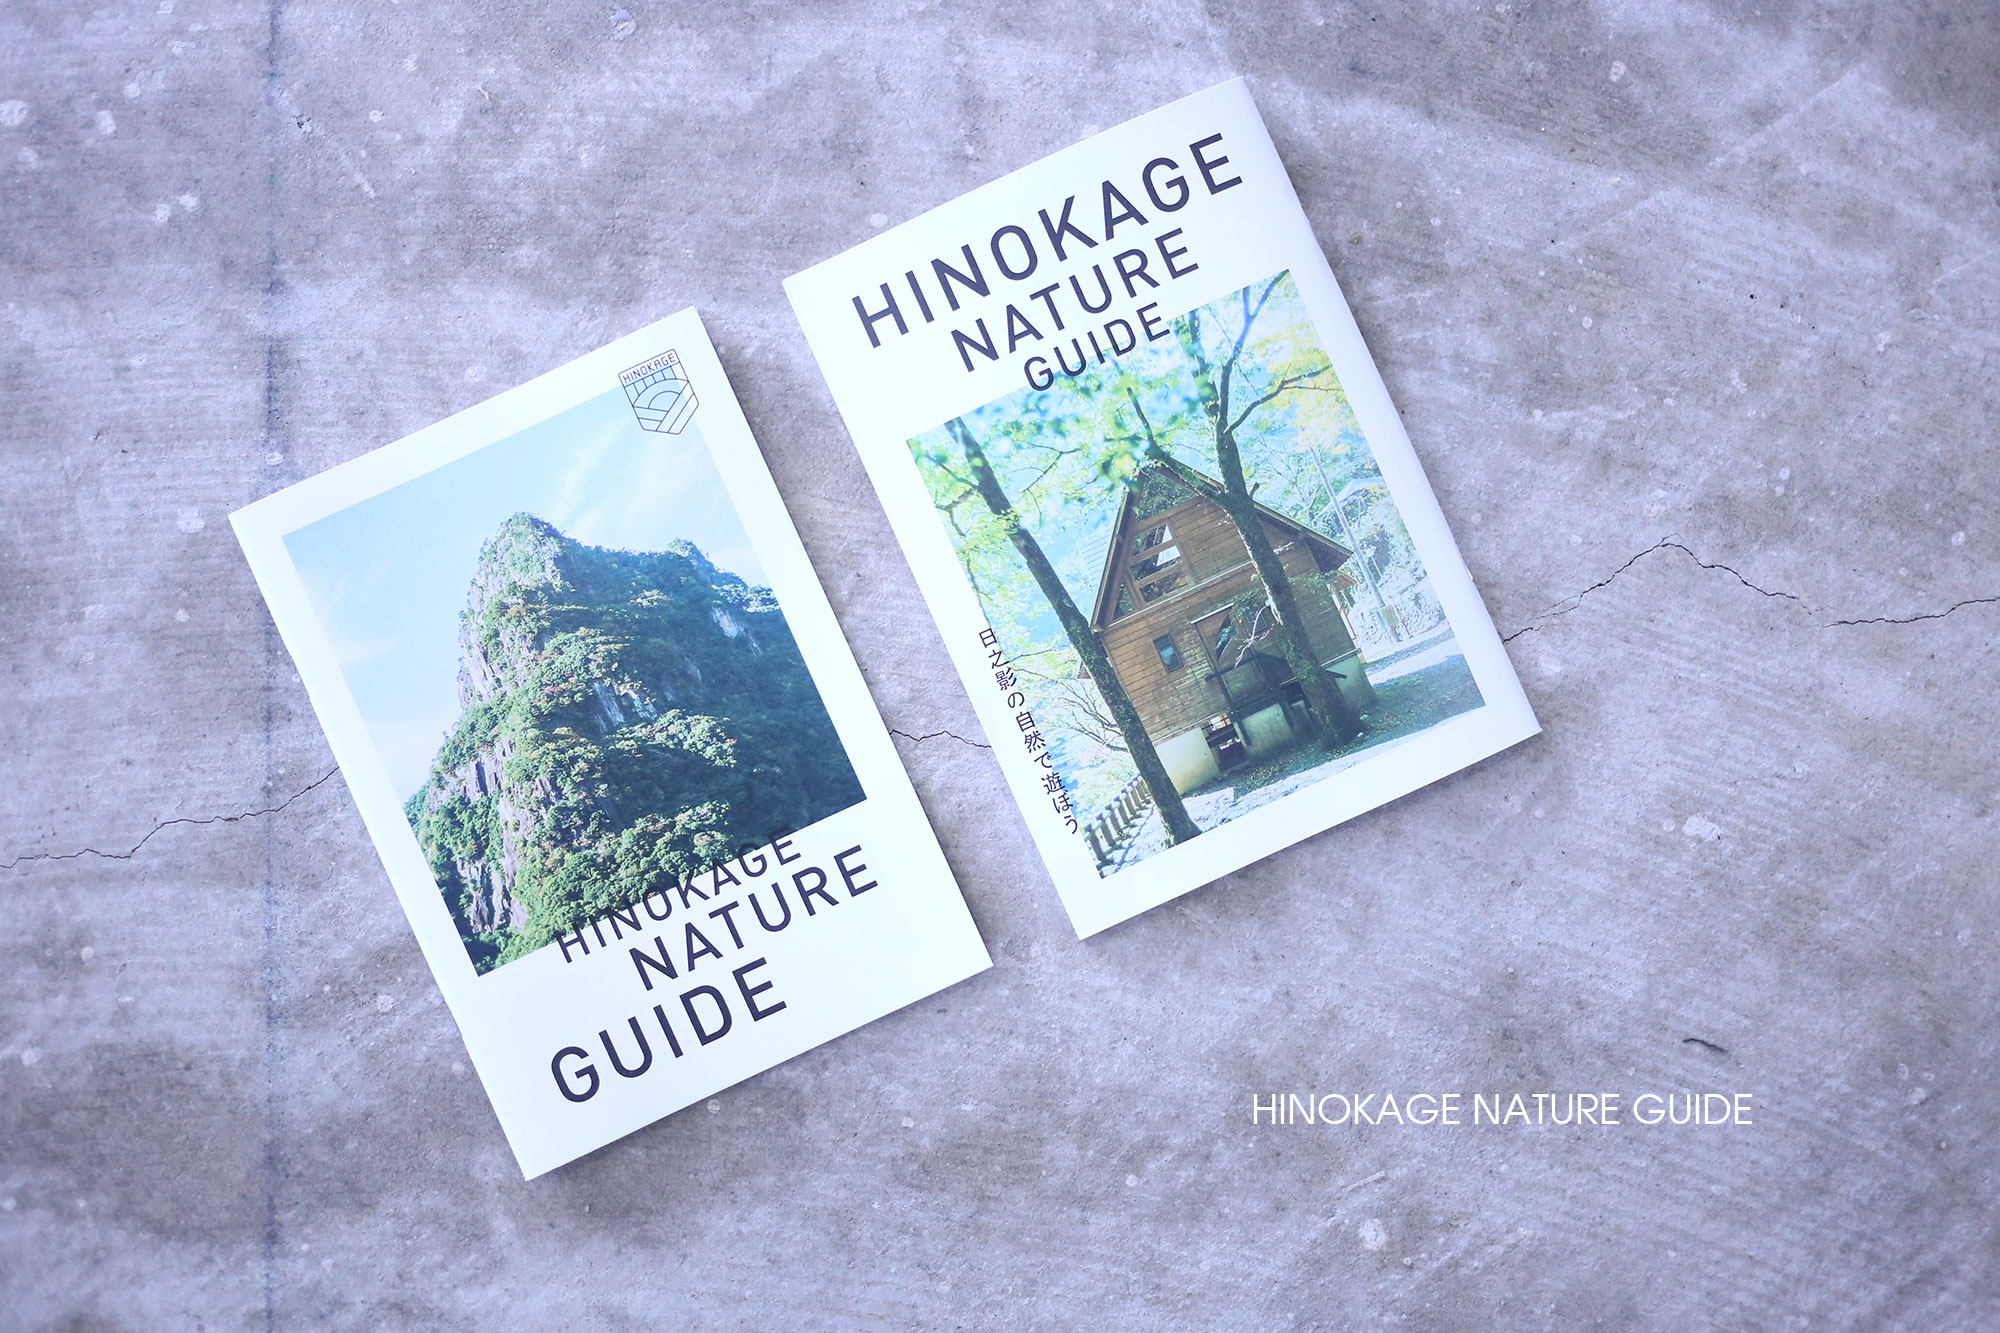 HINOKAGE NATURE GUIDE